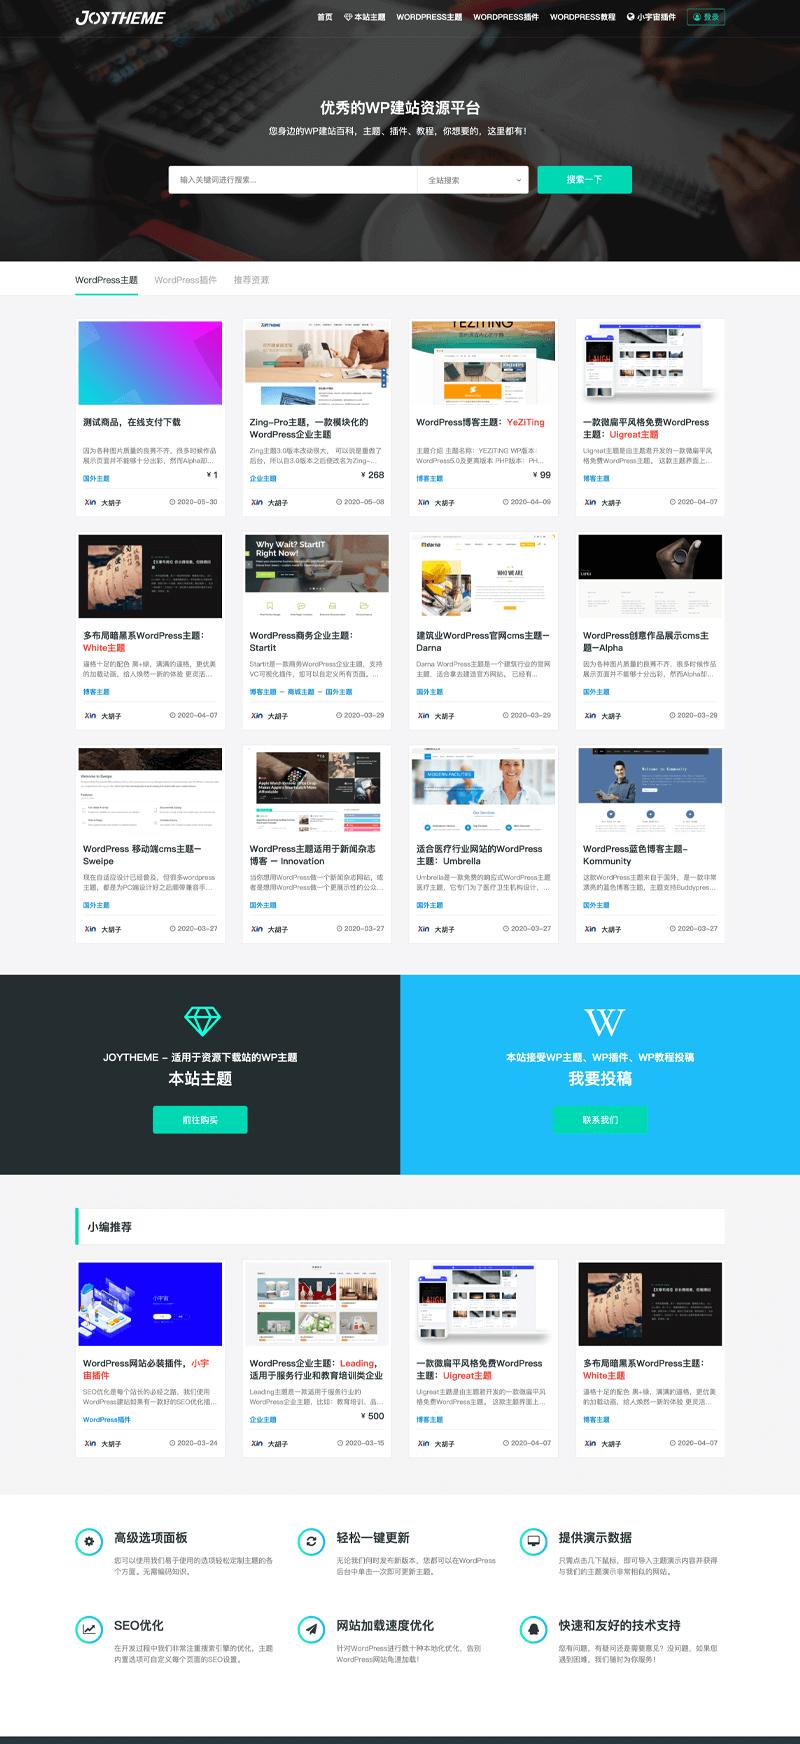 WordPress资源下载类型主题:JoyTheme主题